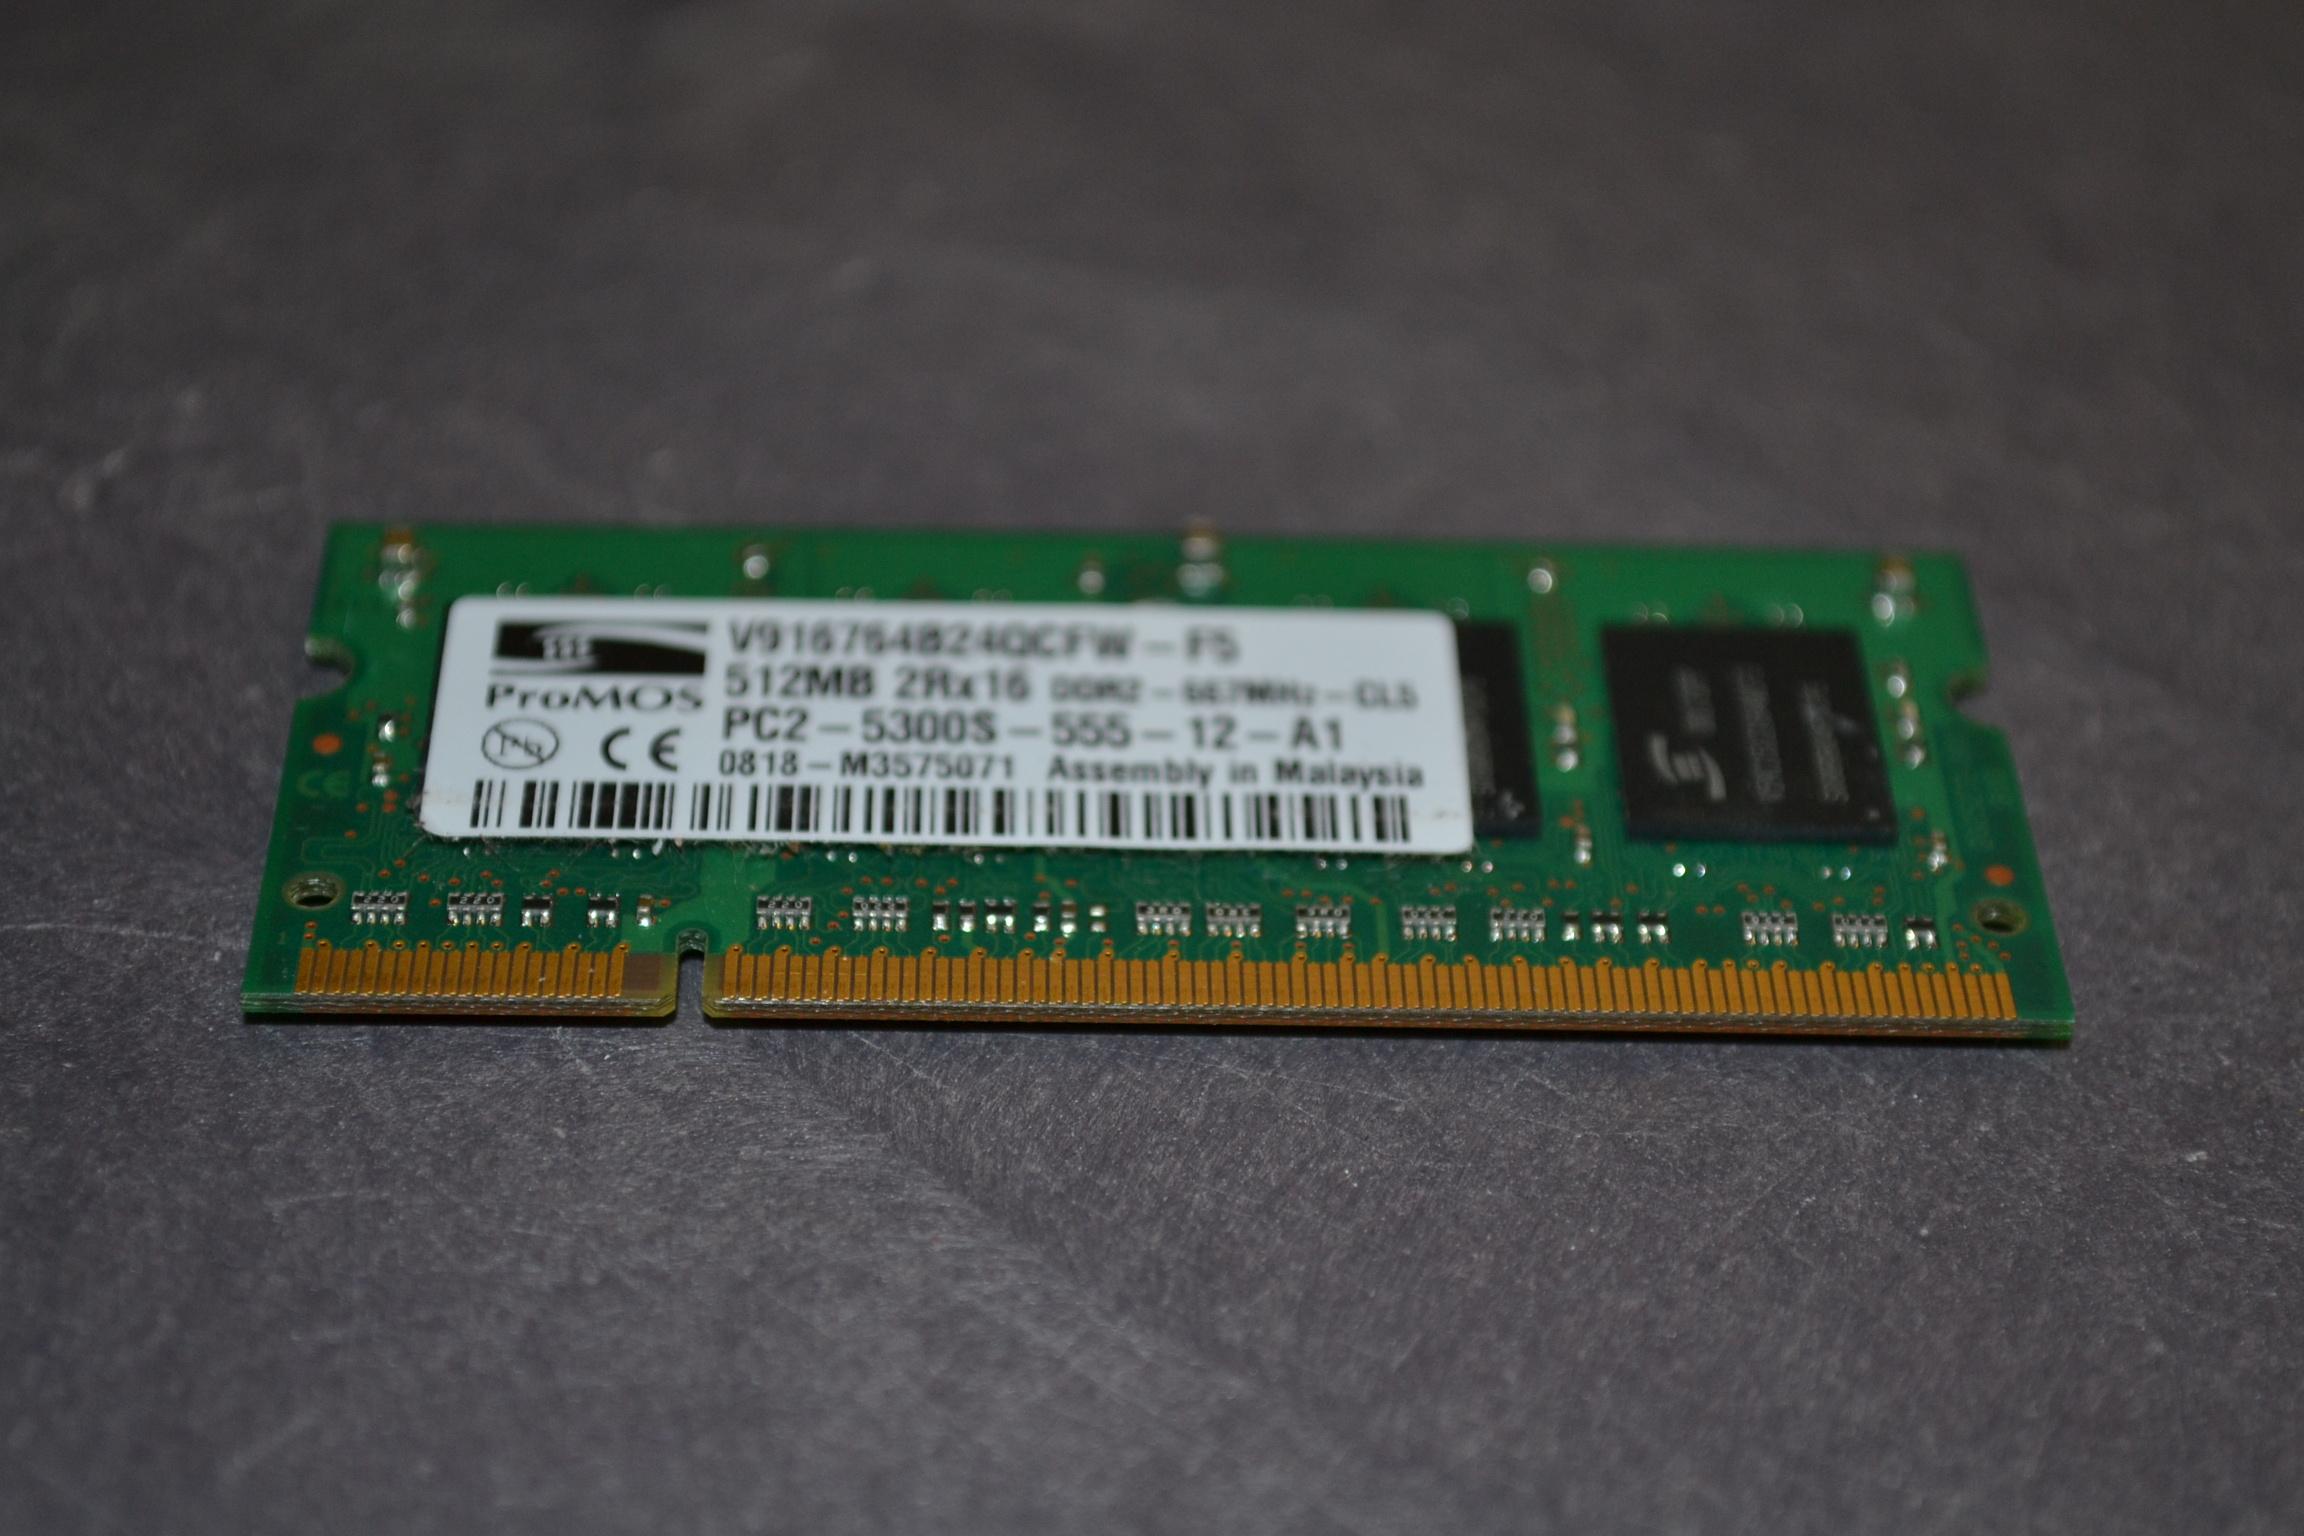 512MB DDR2 667MHZ PC2-5300S V916764B24QBFWF5 Promos V916764B24QBFWF5 Promos V916